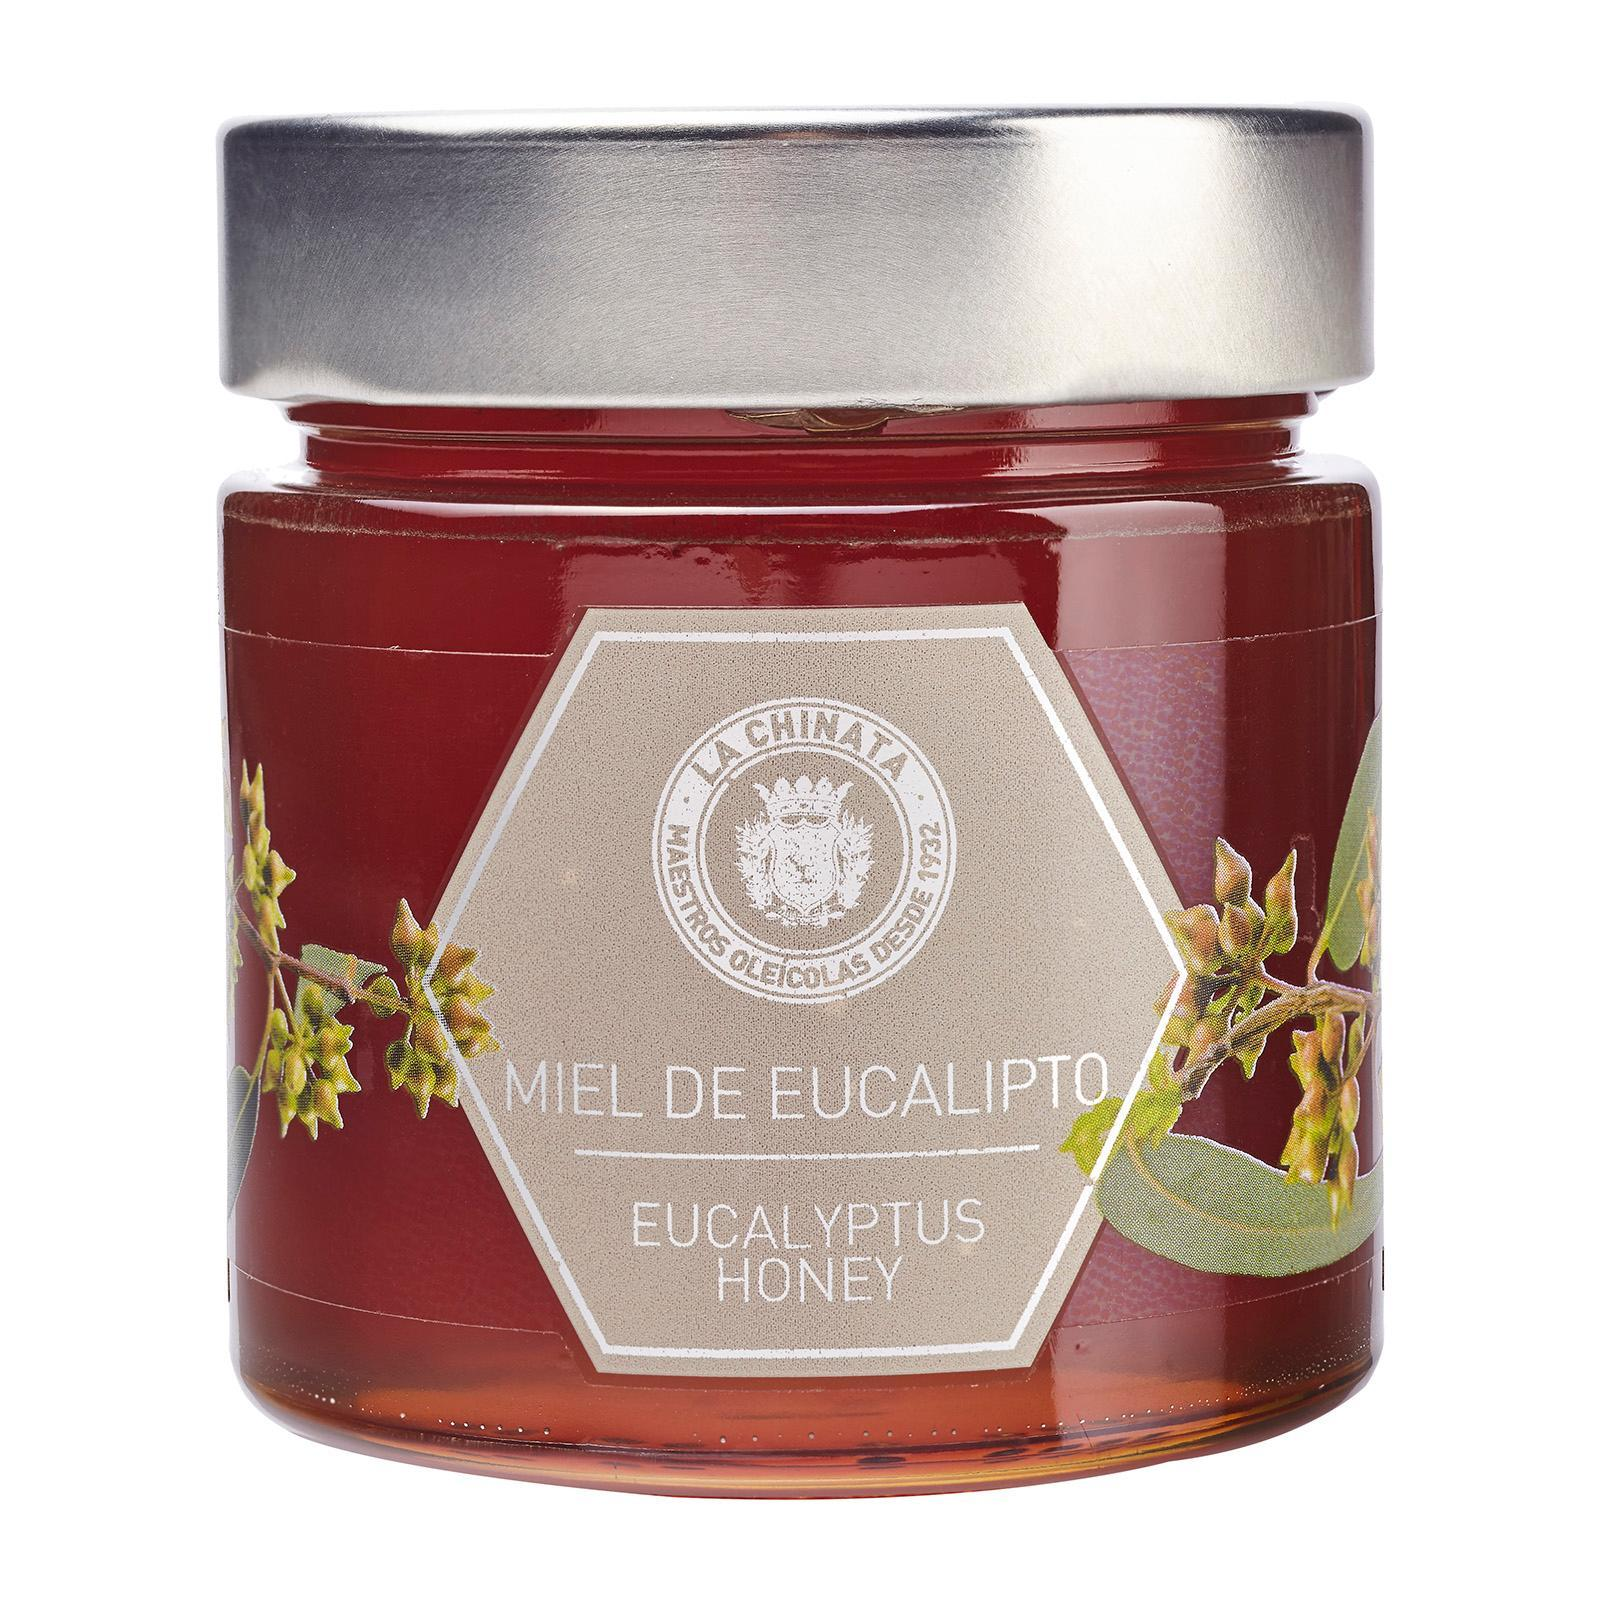 La Chinata Spanish Eucalyptus Honey - By TANINOS